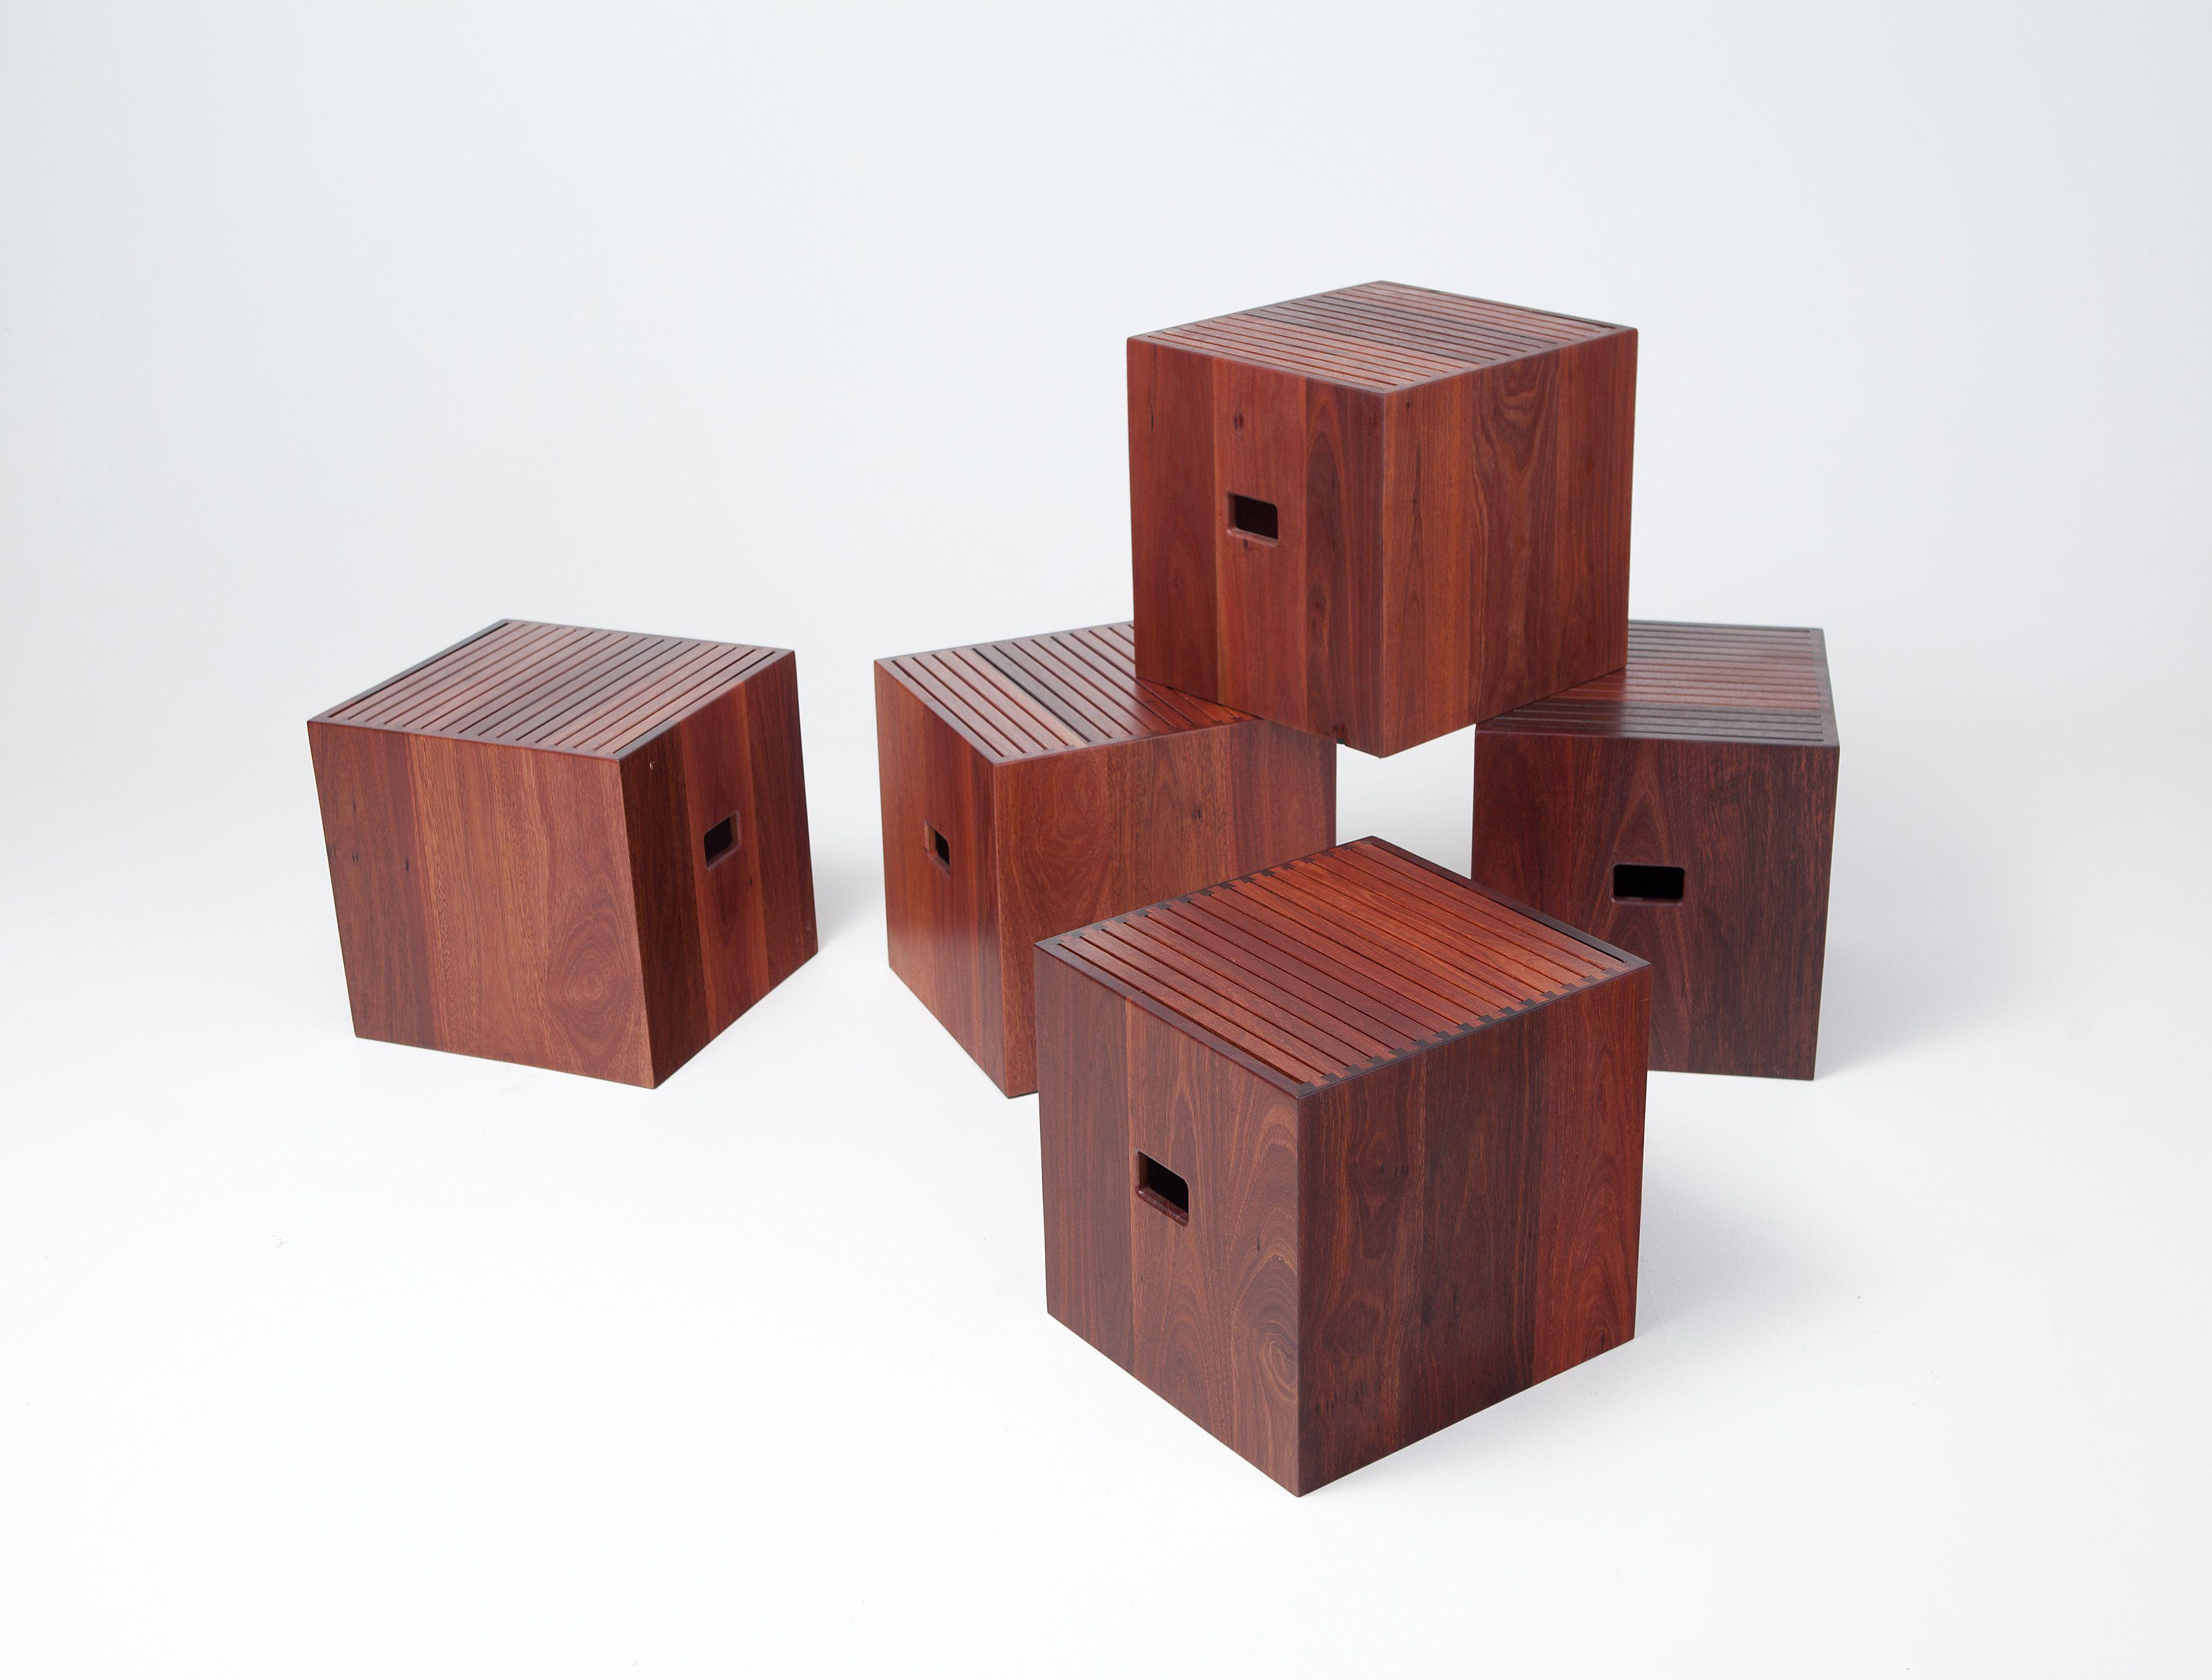 Slatted Cubes